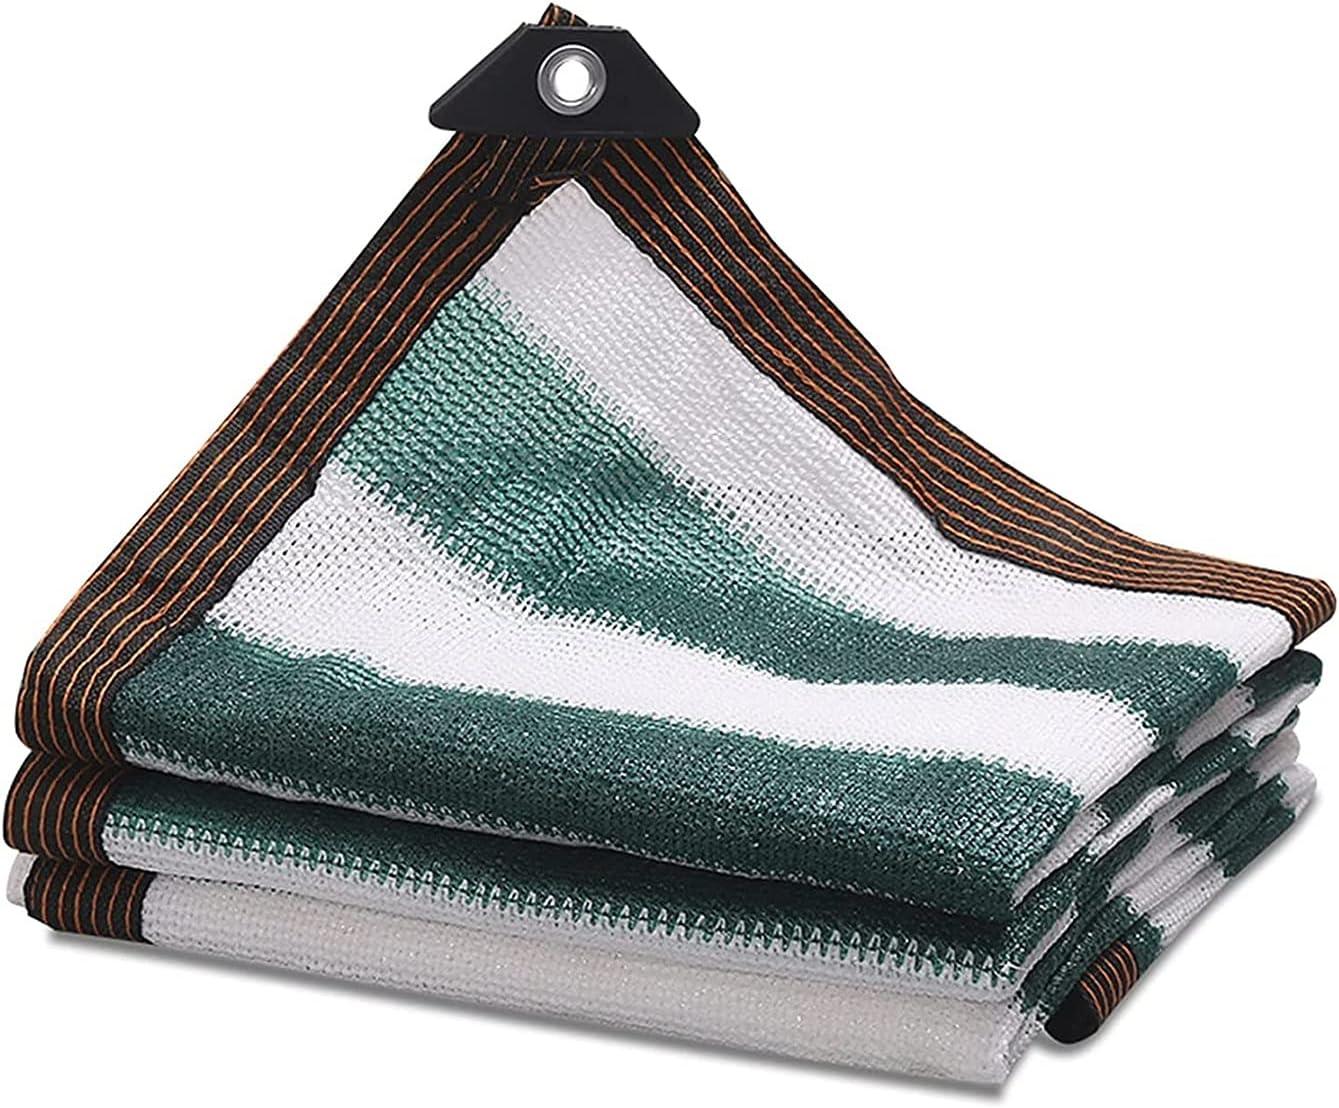 LLCY Shade Cloth Dark Green Max 67% OFF Stripe 90% White Jacksonville Mall Sunbloc